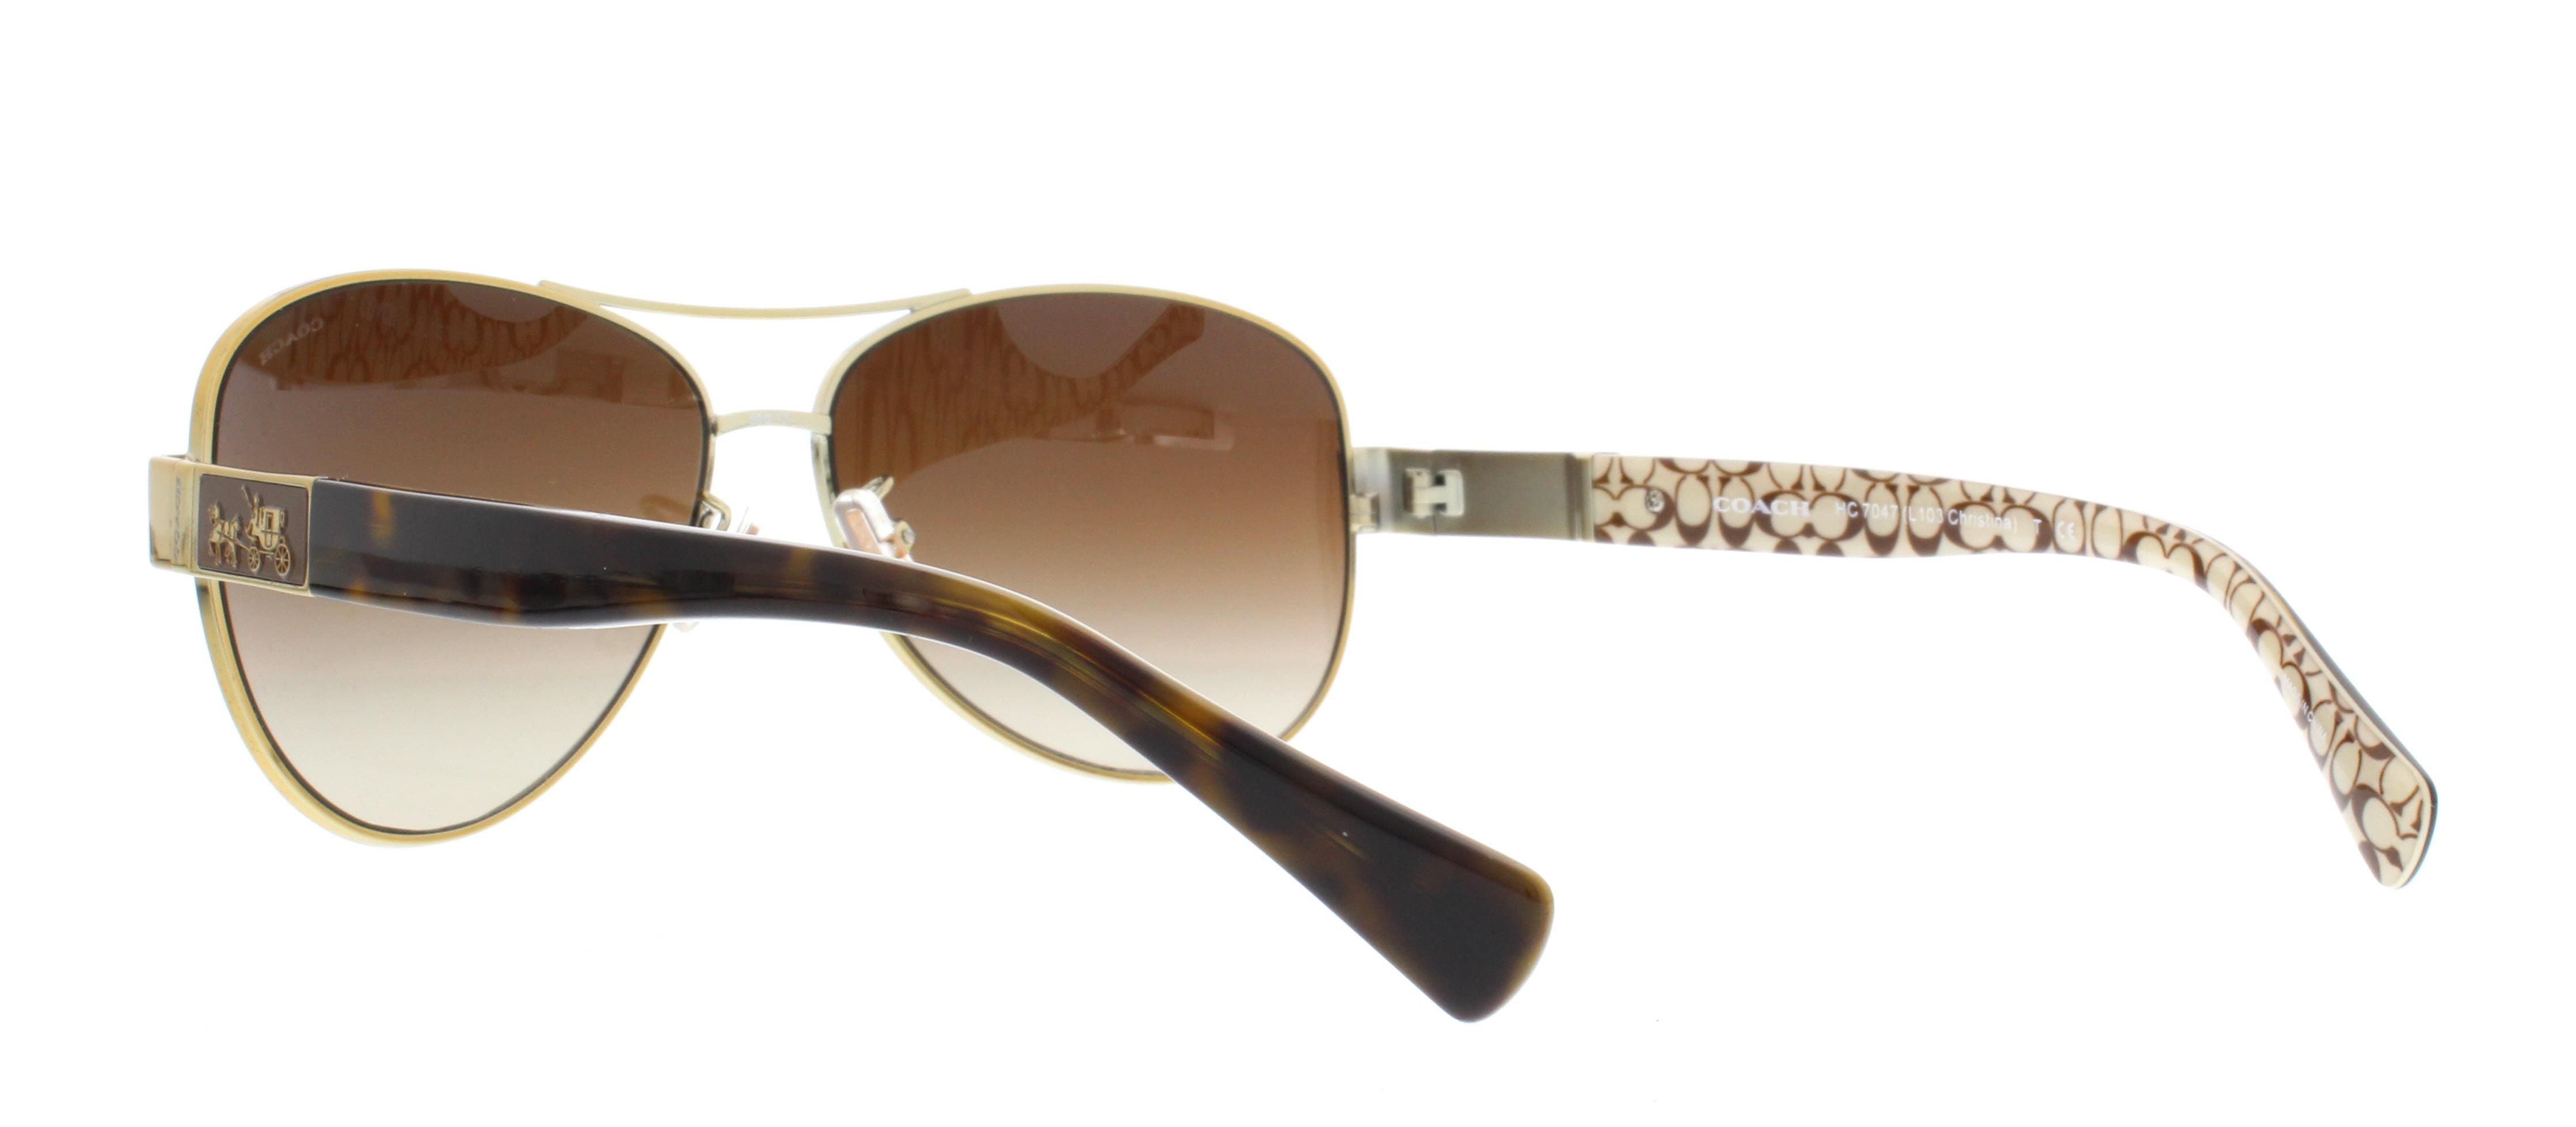 3d90dca7161 ... where can i buy coach hc7047 polarized sunglasses walmart 3d8c9 a7817